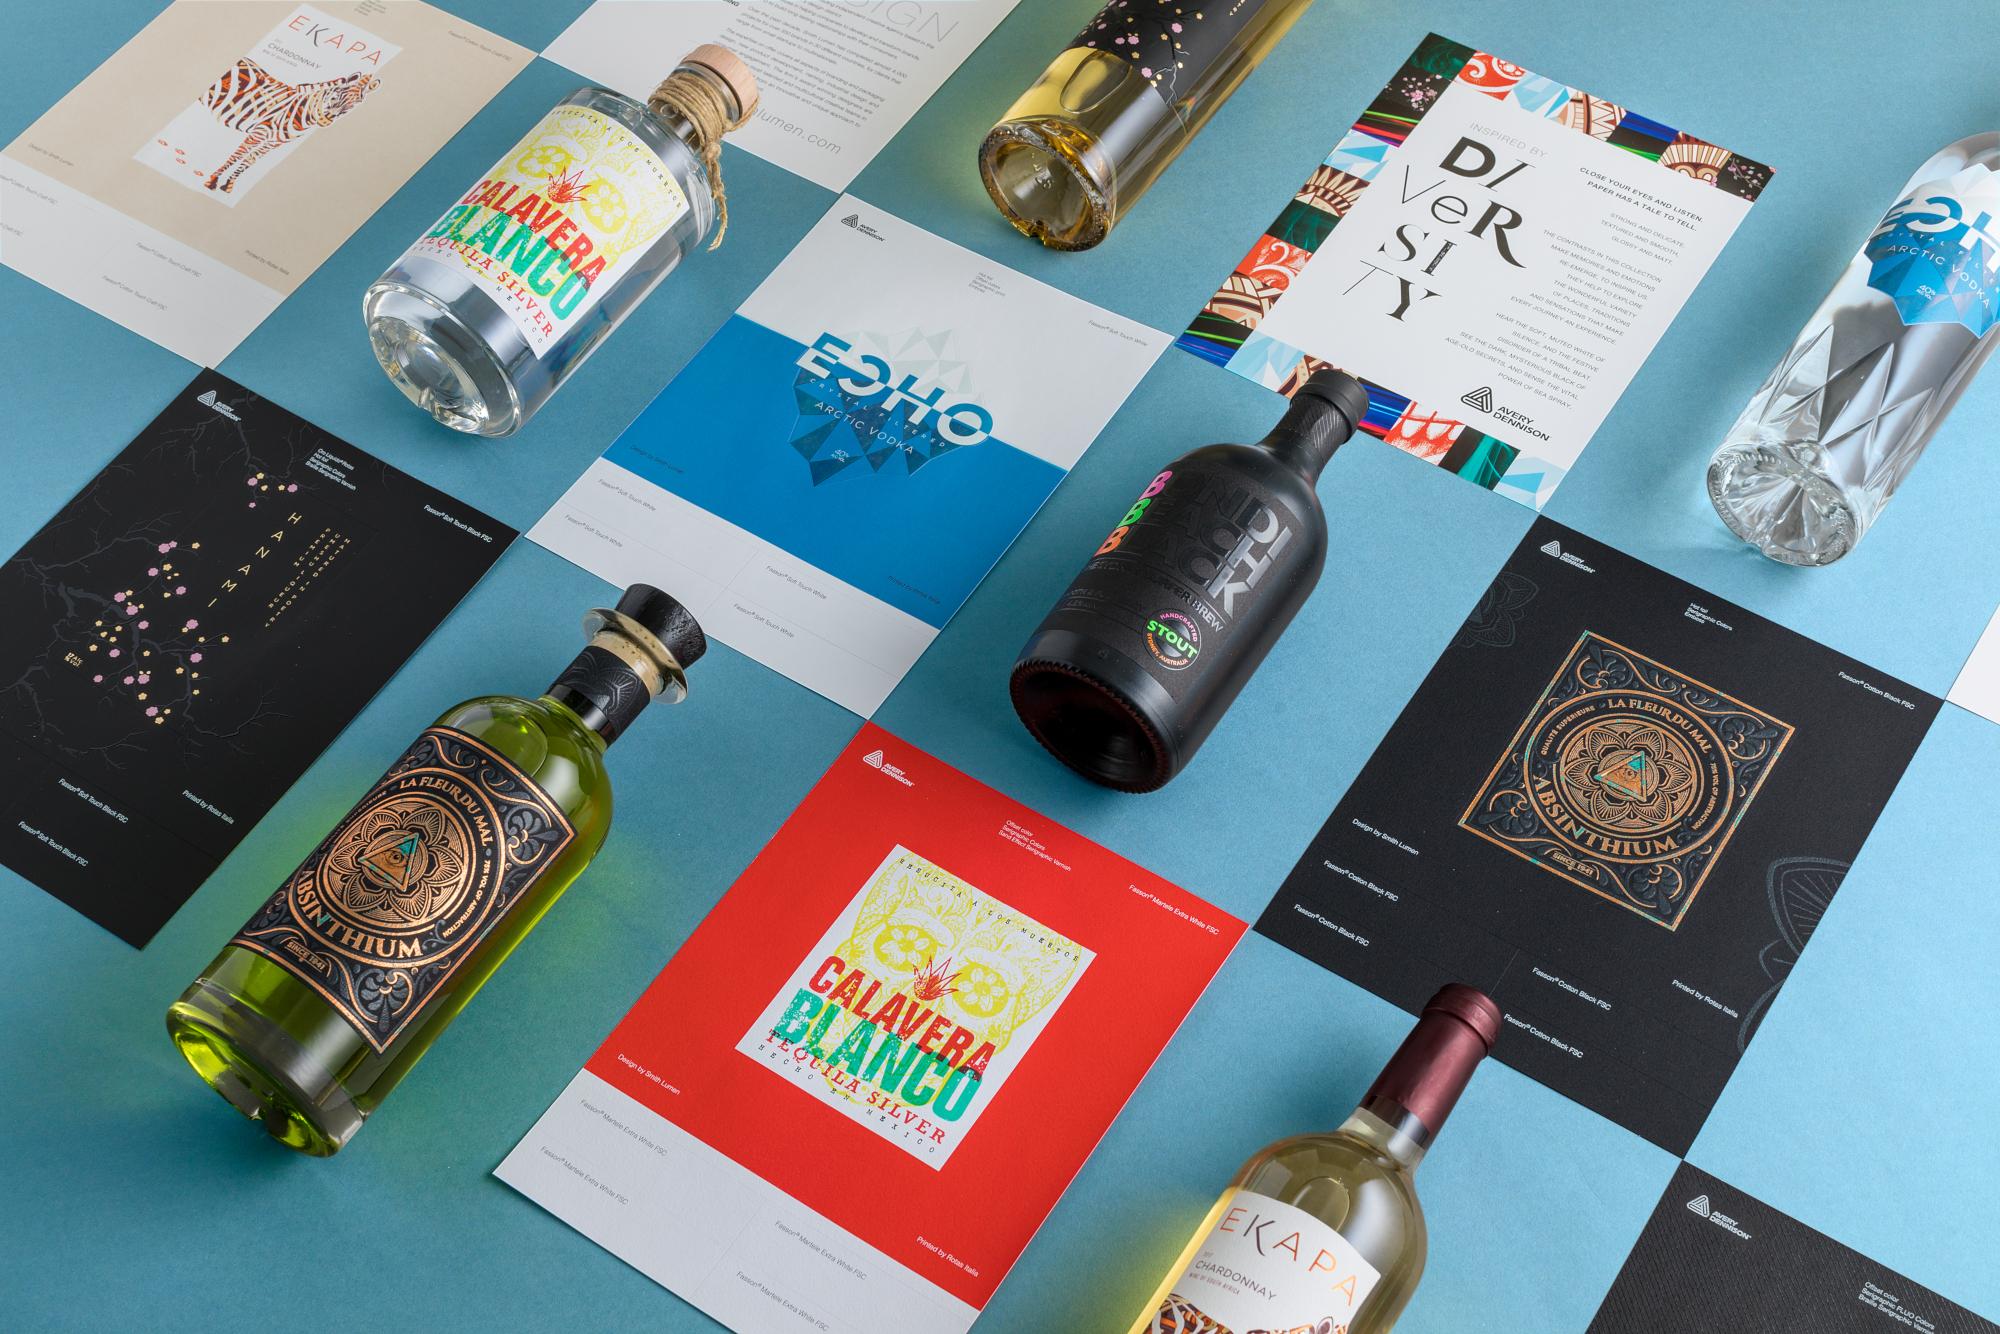 Avery Dennison launches M_use™, a design inspiration platform